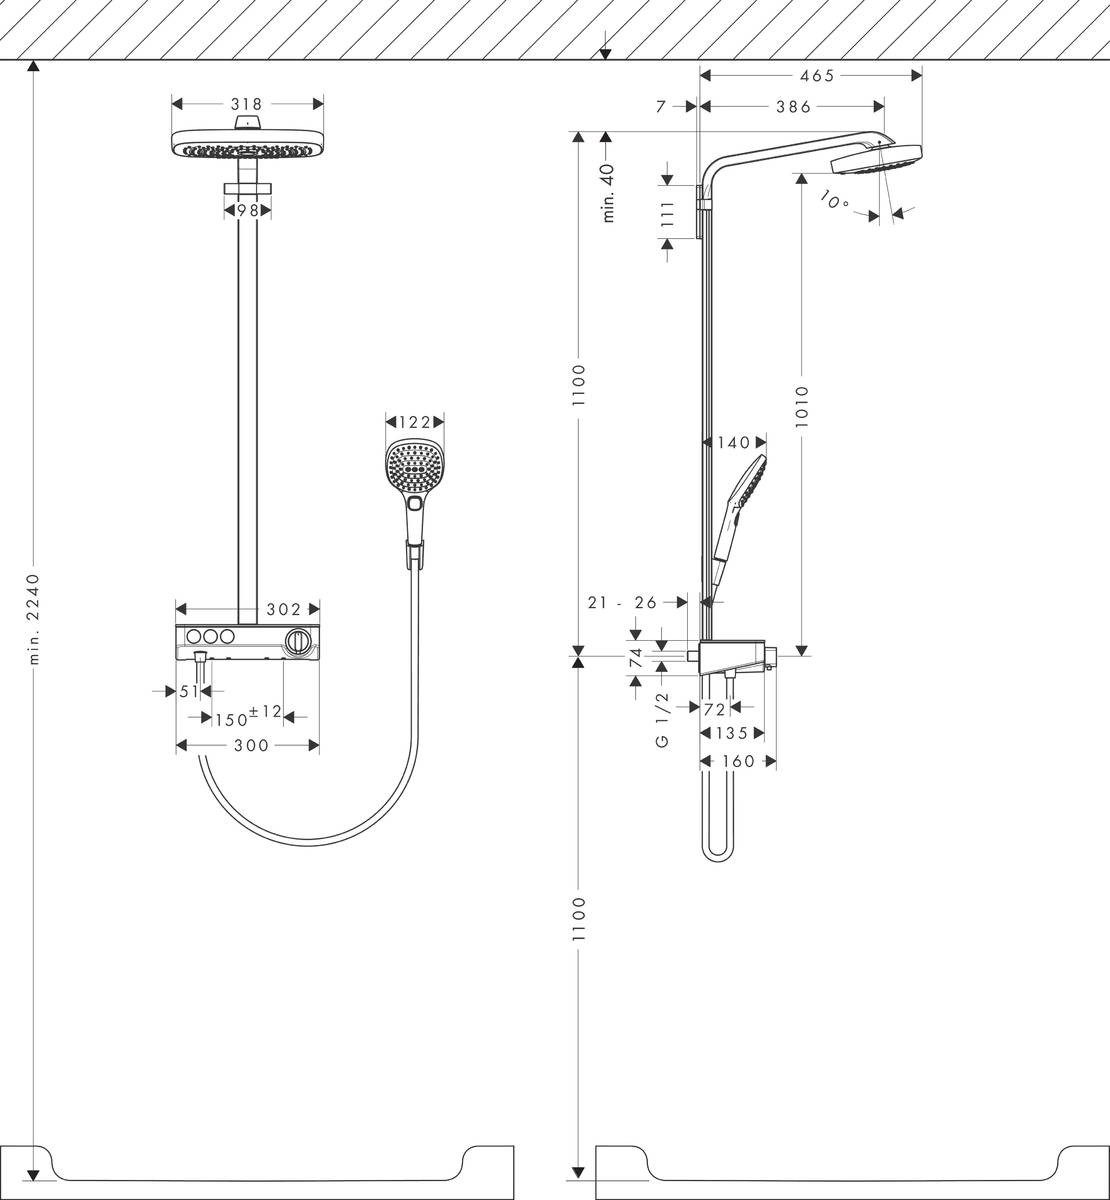 hansgrohe showerpipes raindance select e 3 strahlarten art nr 27127400 hansgrohe de. Black Bedroom Furniture Sets. Home Design Ideas